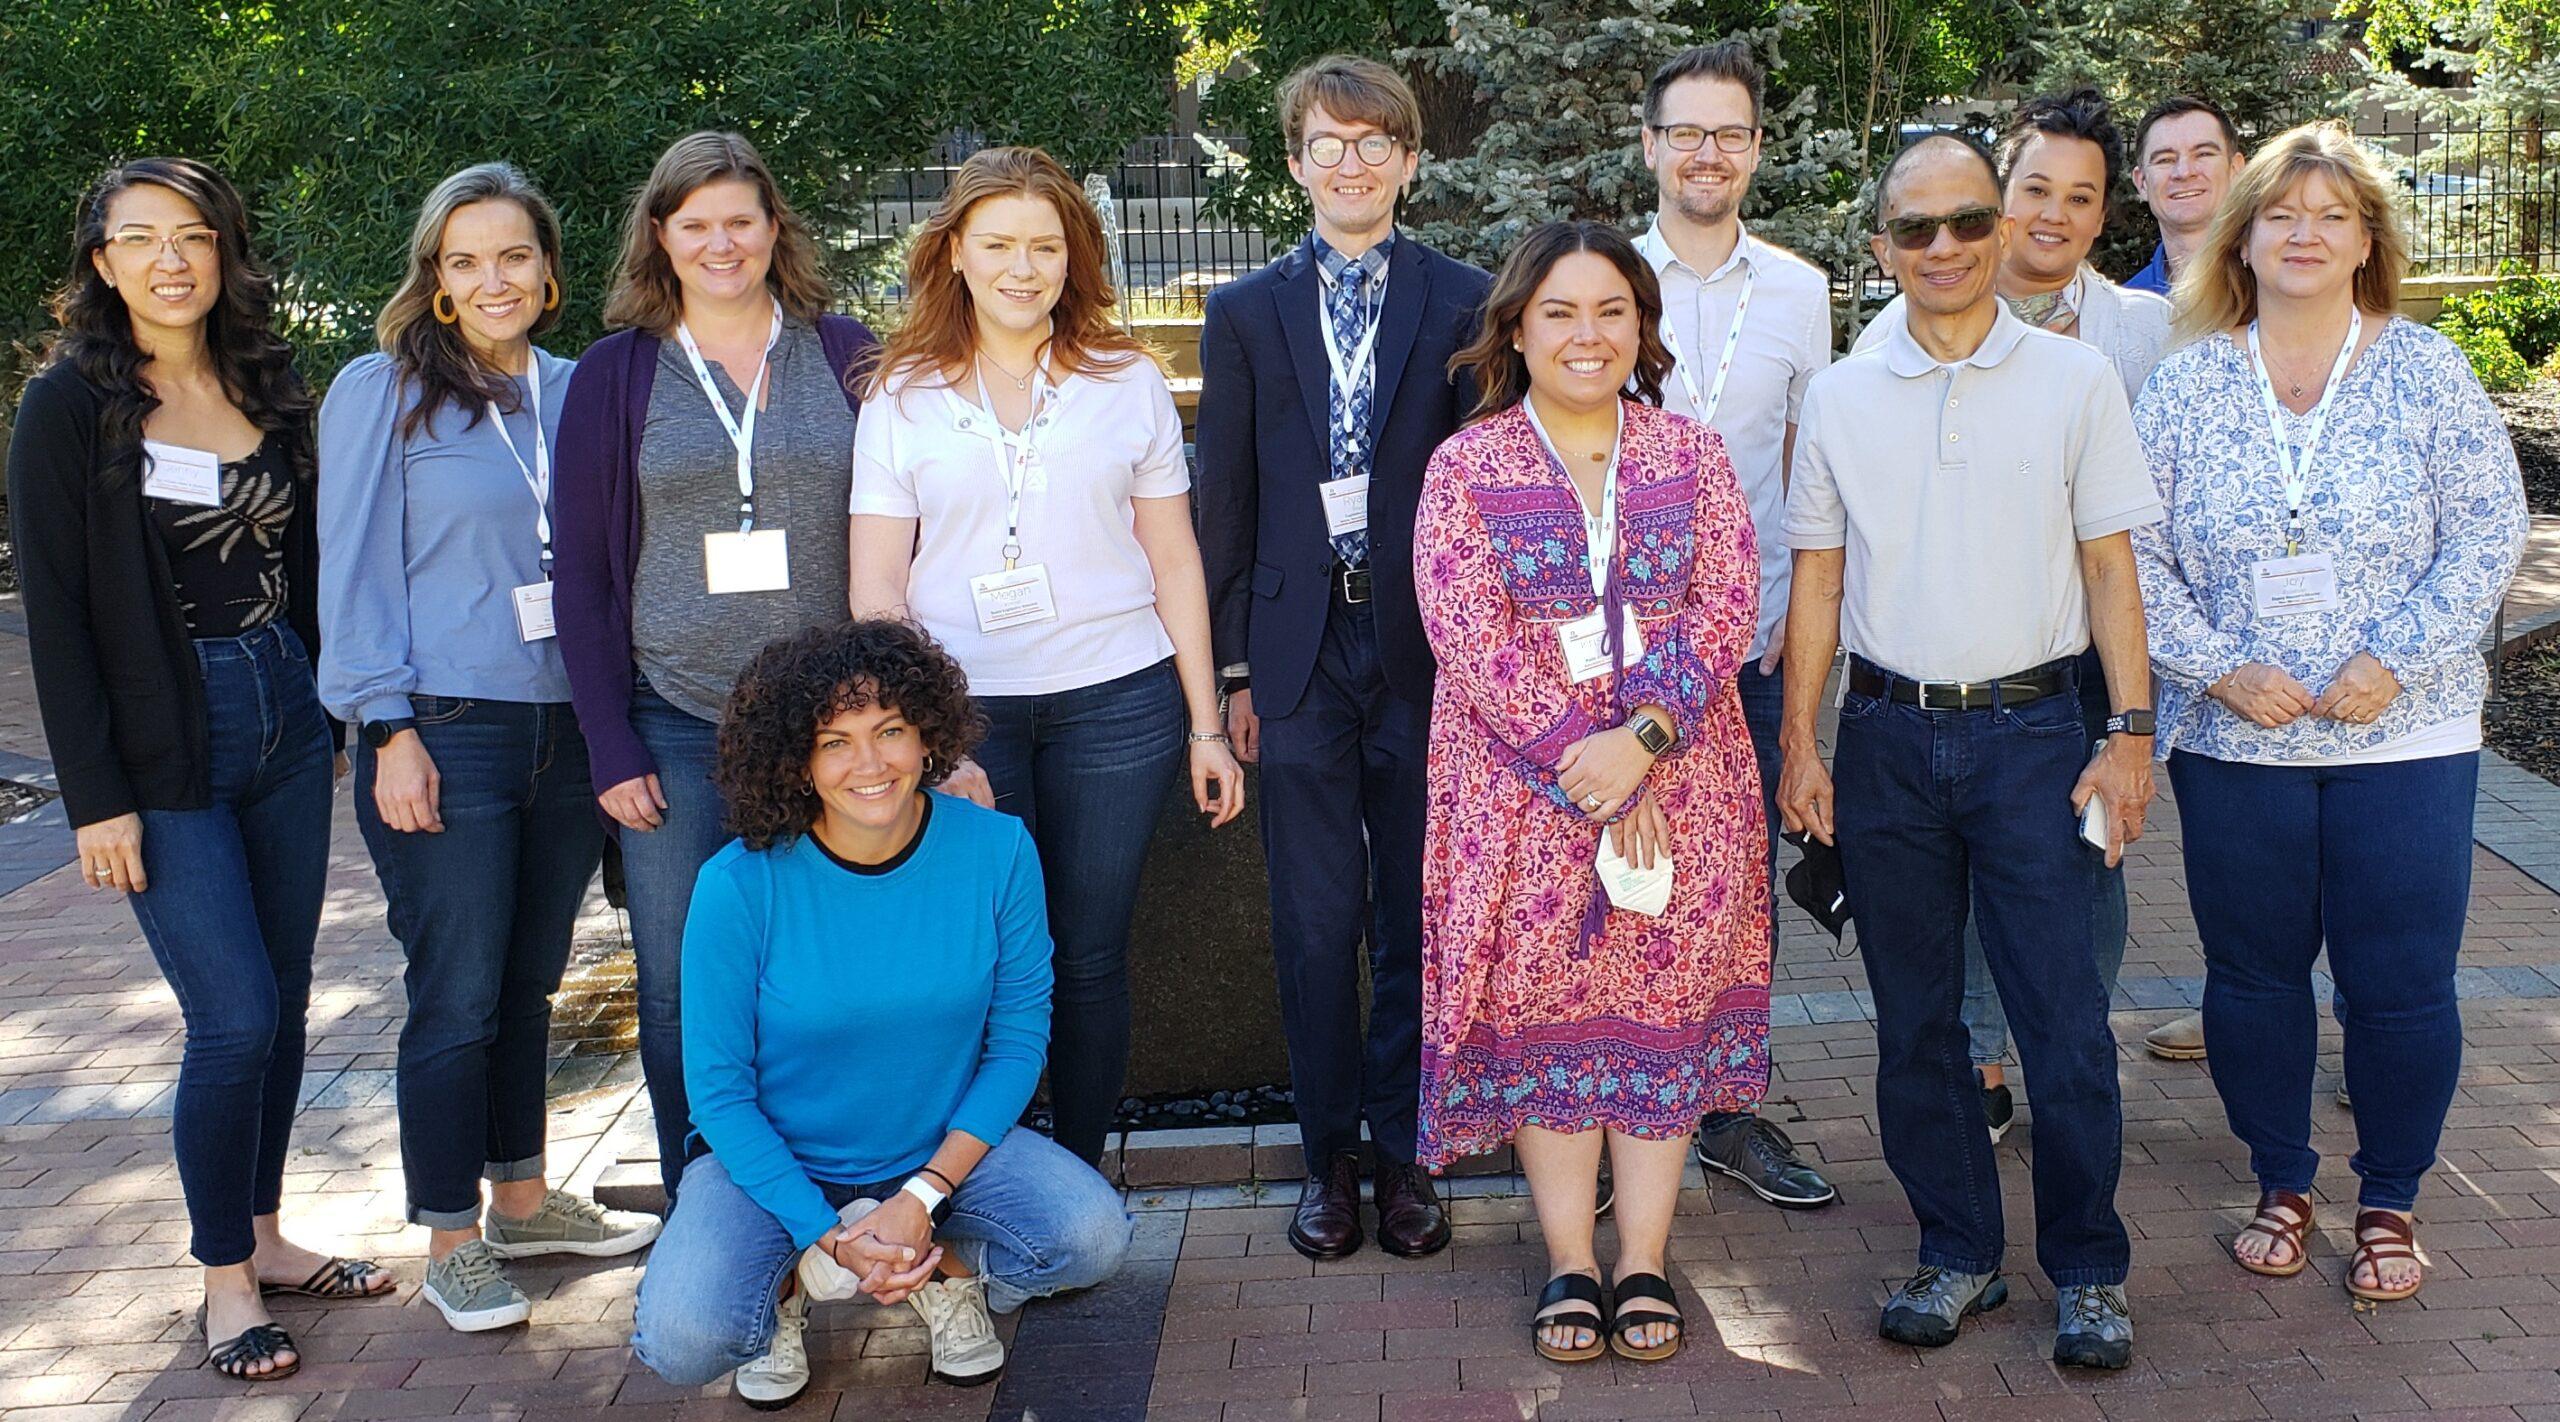 IAC Staff Attends Western States Association Meeting